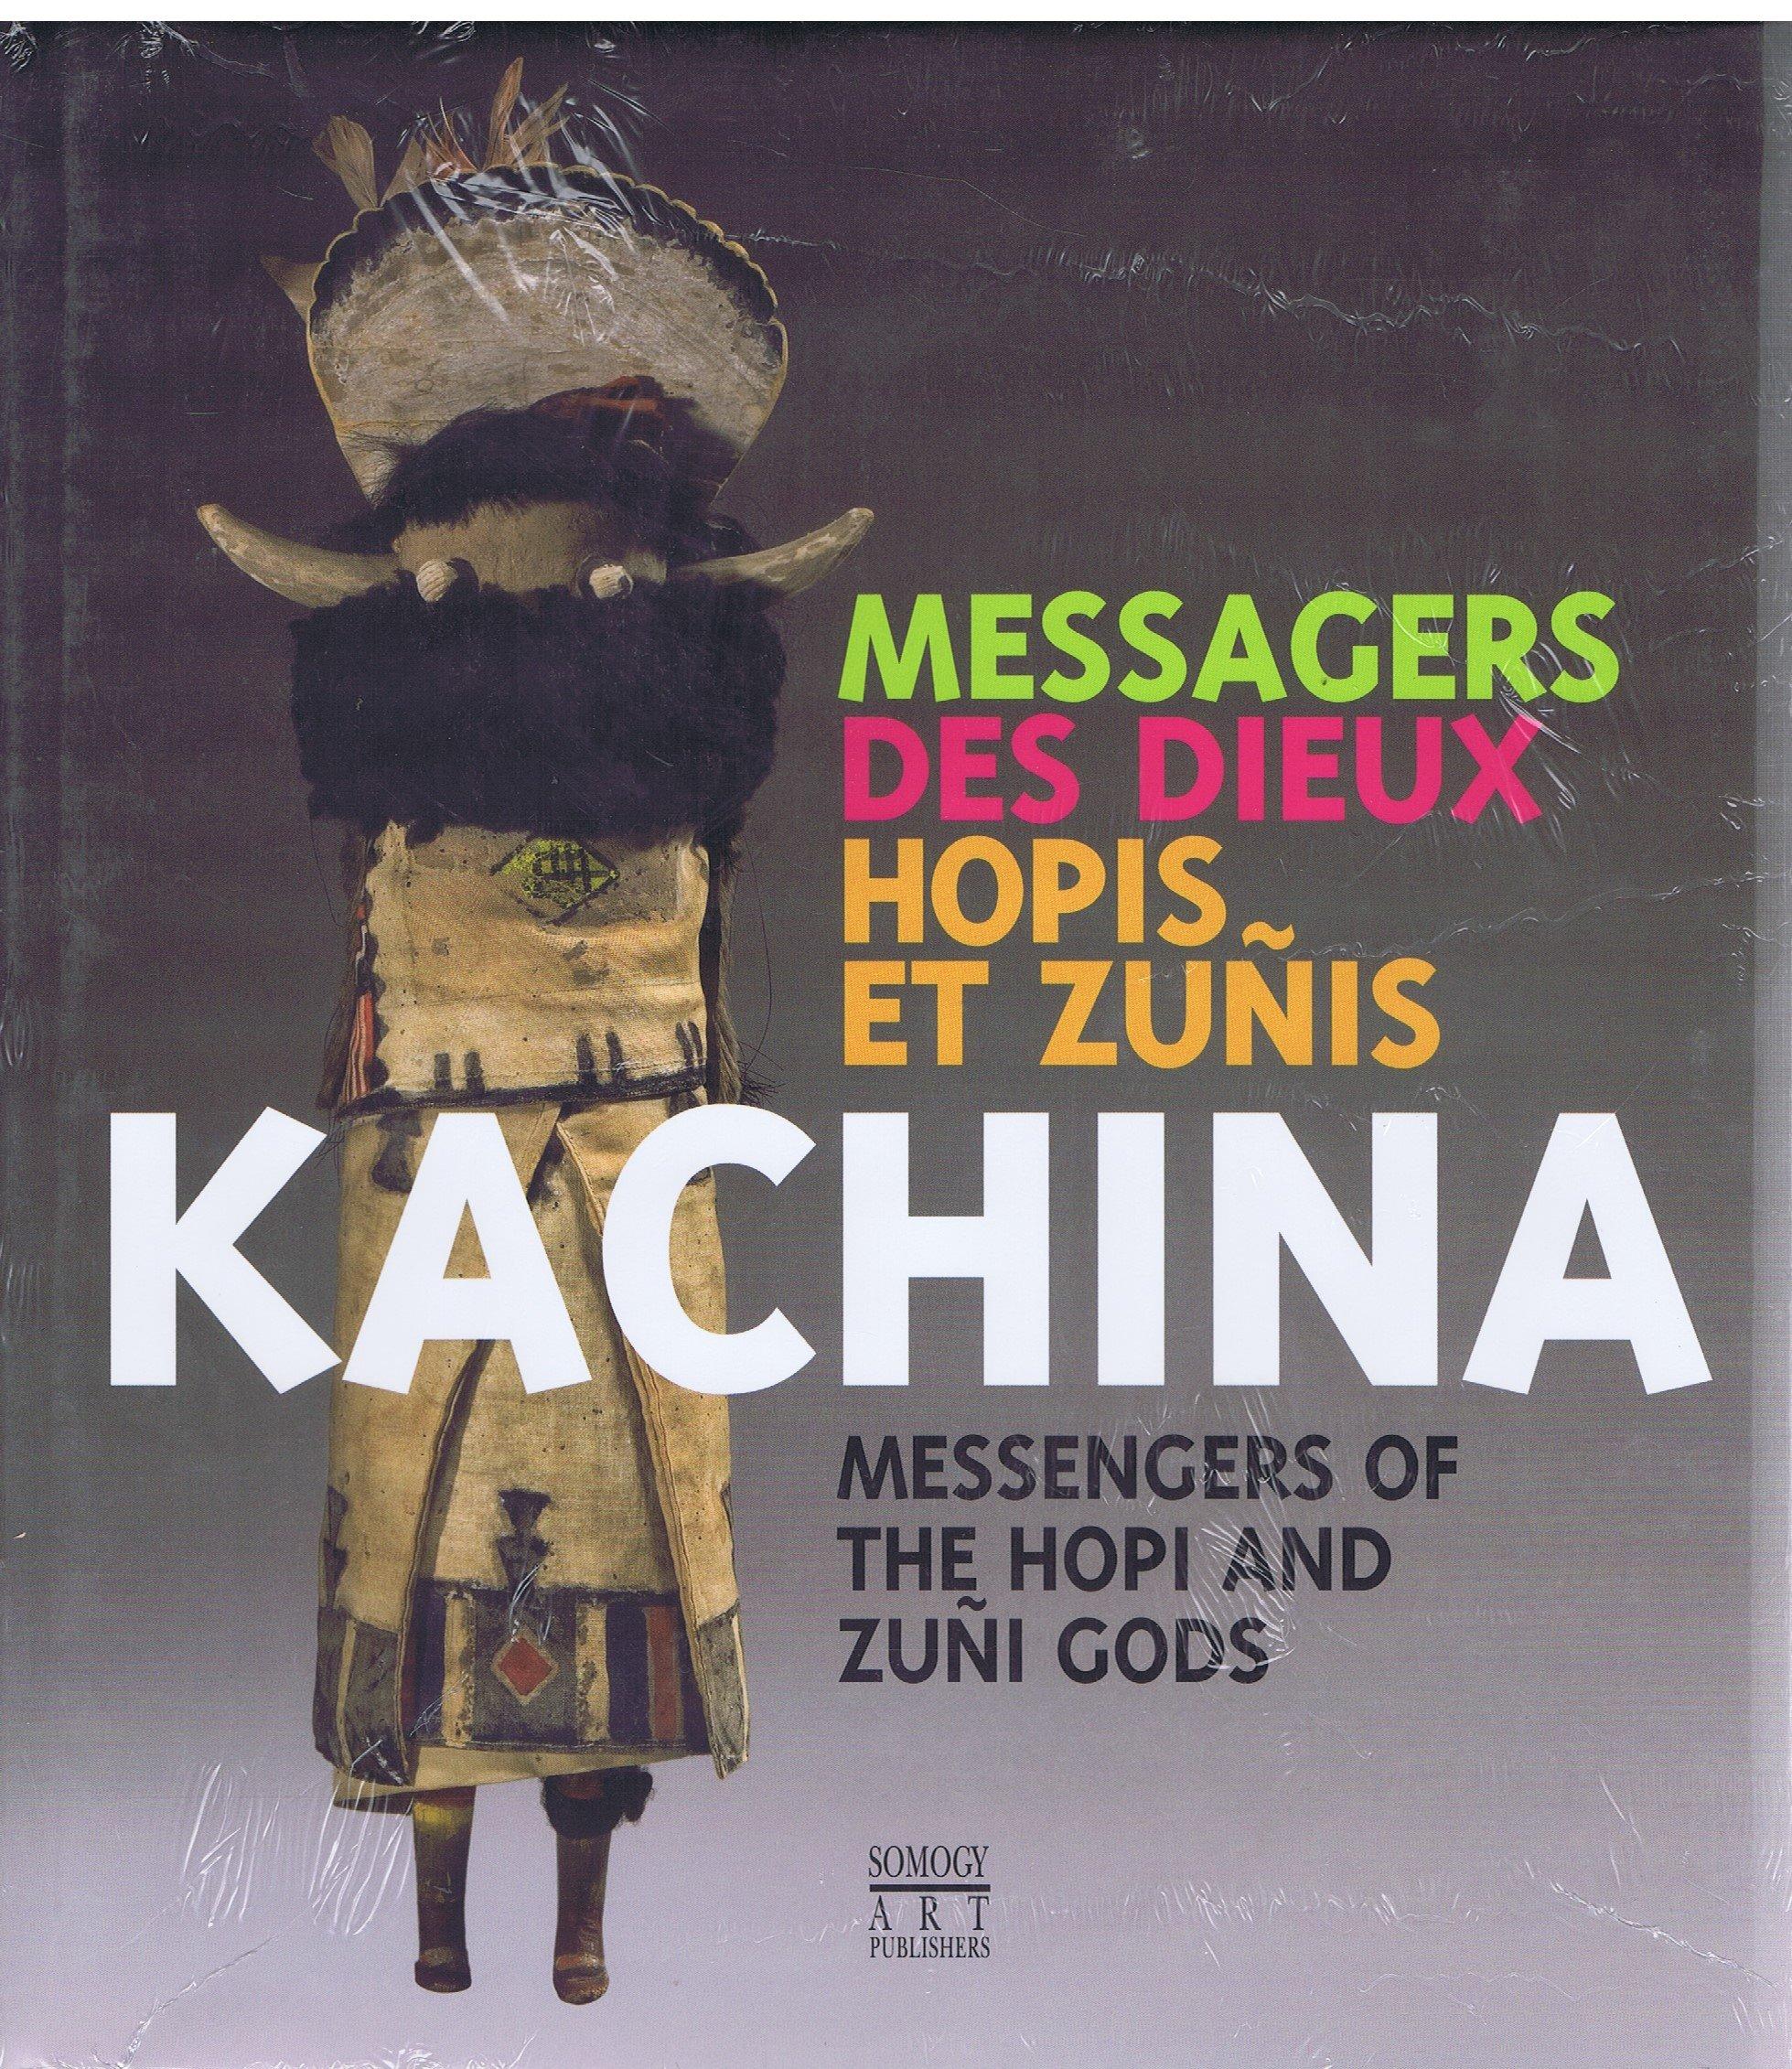 Download Kachina : Messagers Des Dieux Hopis Et Zunis / Messengers of the Hopi and Zuni Gods ePub fb2 ebook